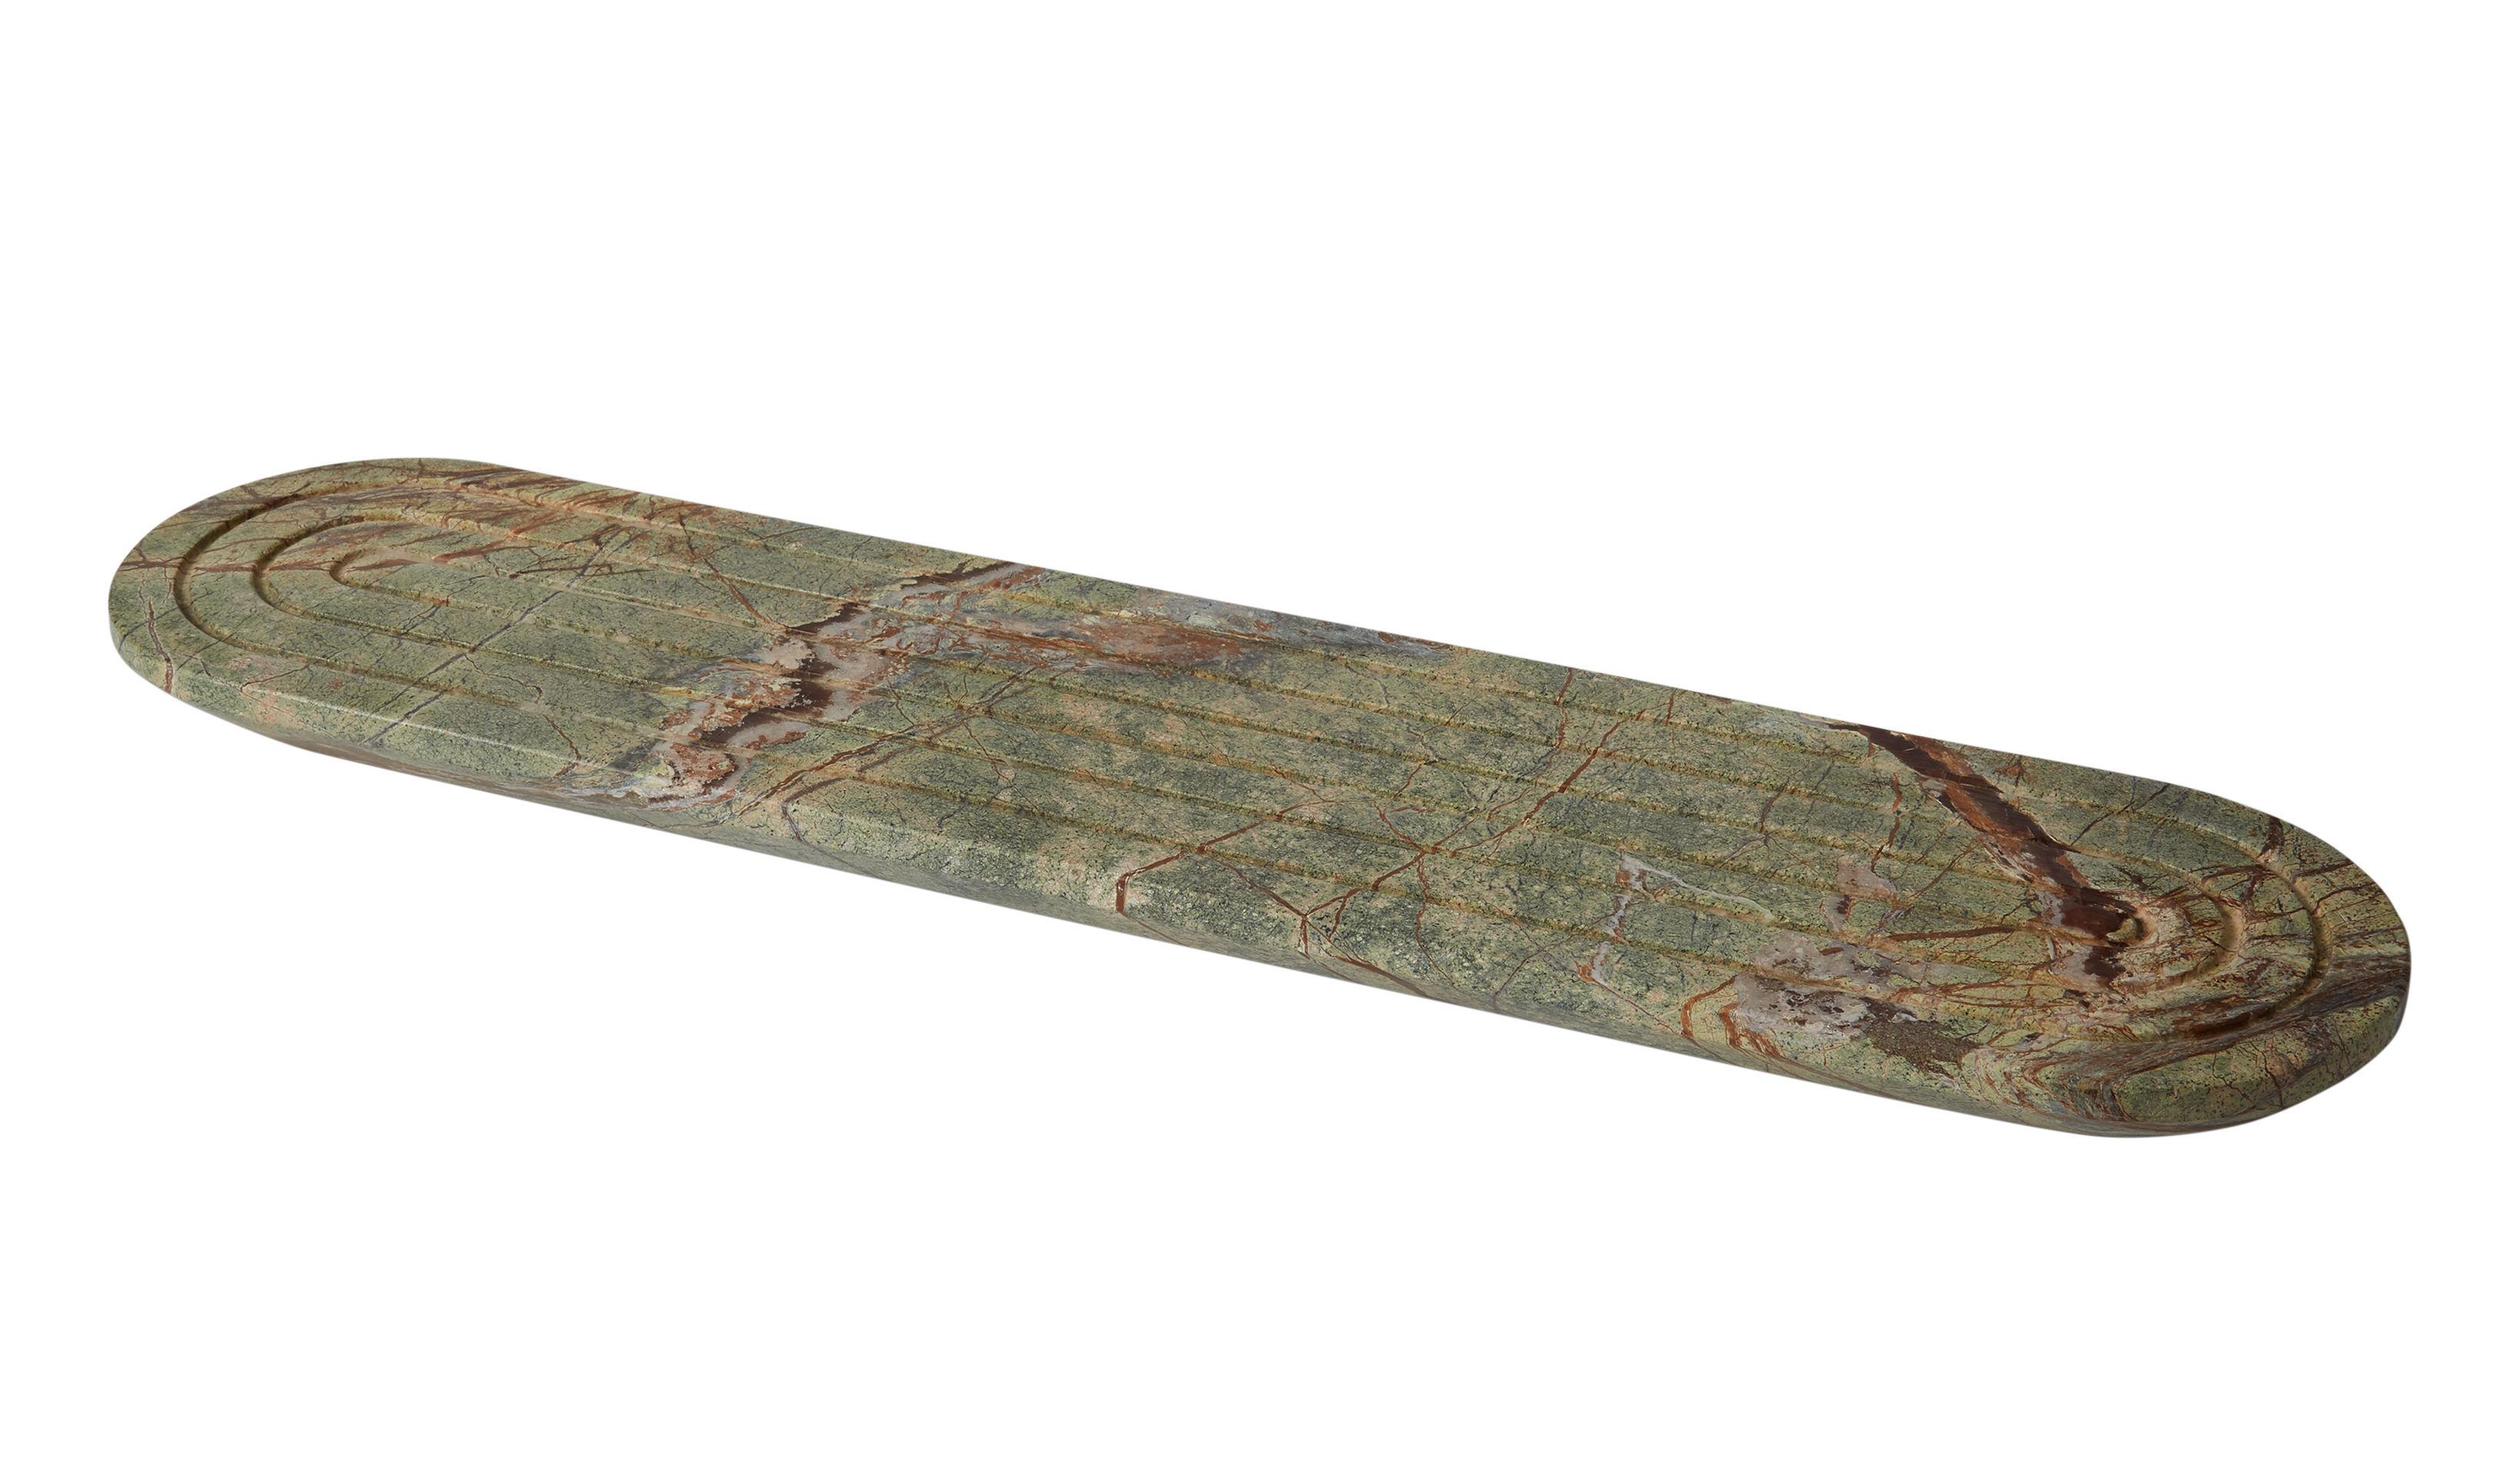 Tischkultur - Tabletts - Rock Long Tablett / Marmor - 60 x 14 cm - Tom Dixon - Lang / grün - Marmor